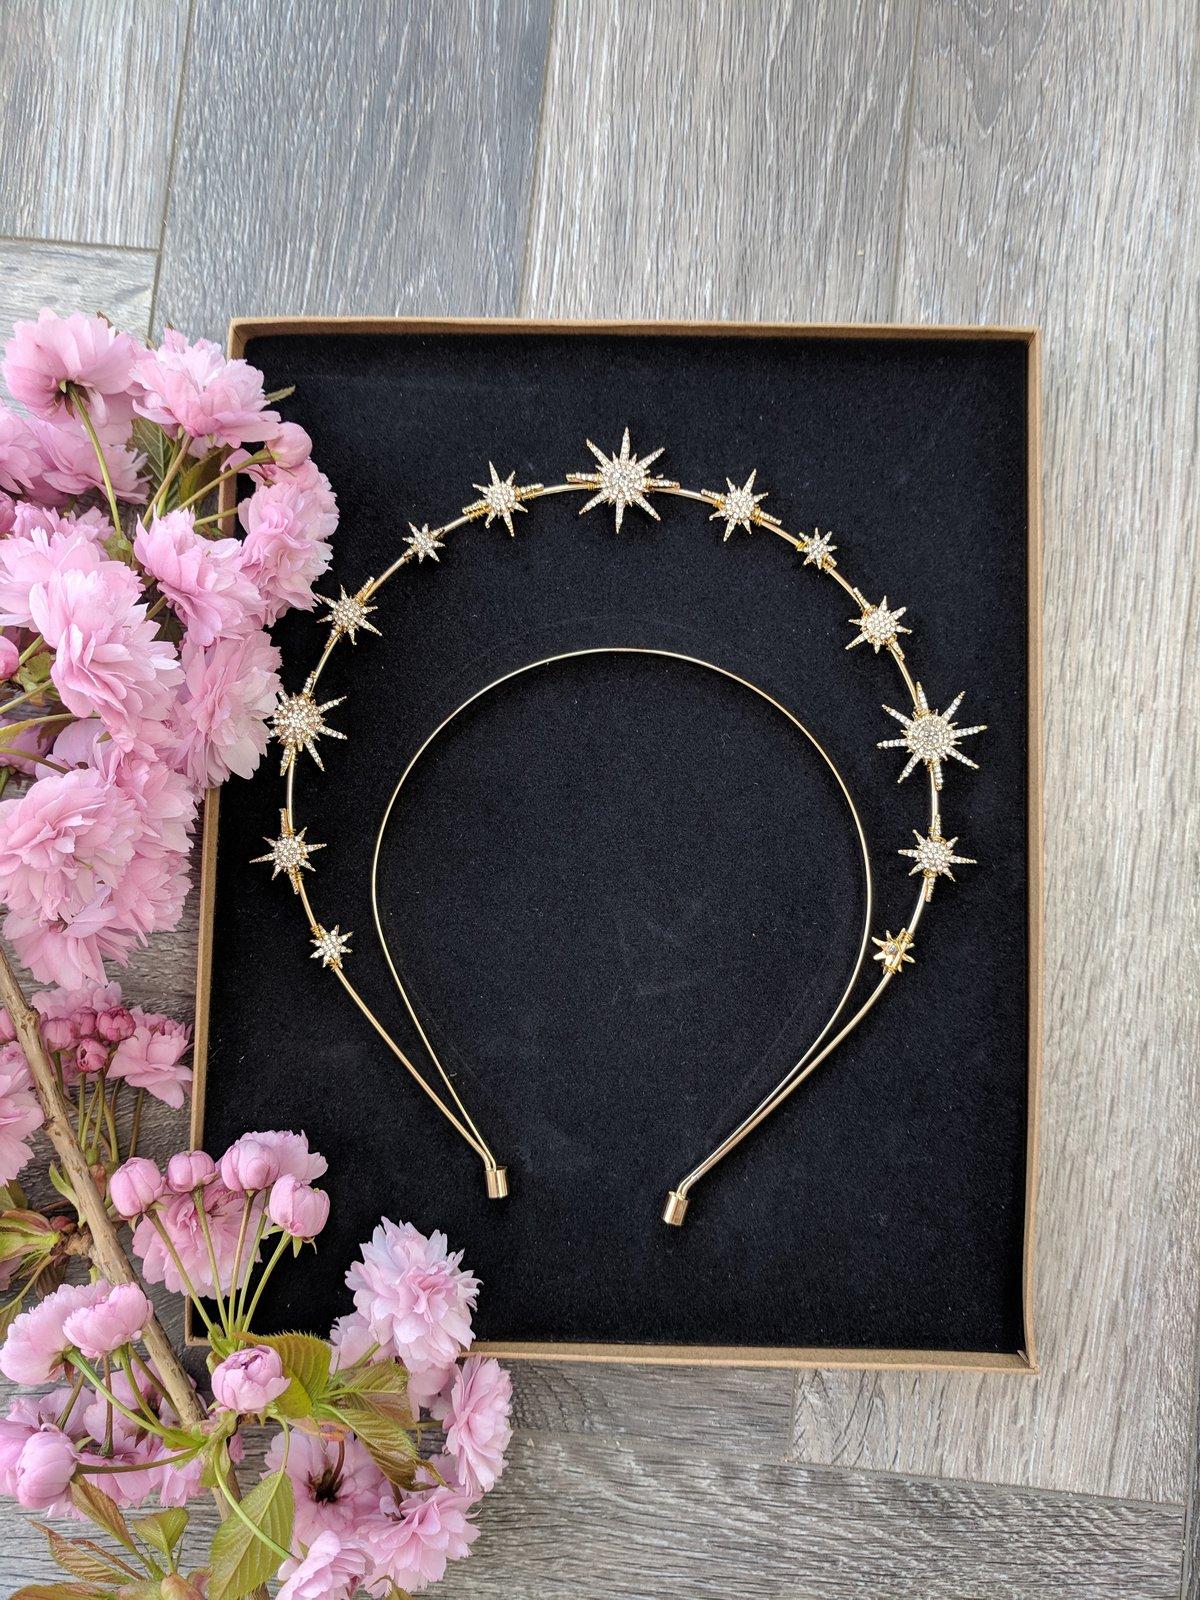 Orion's Belt halo headband